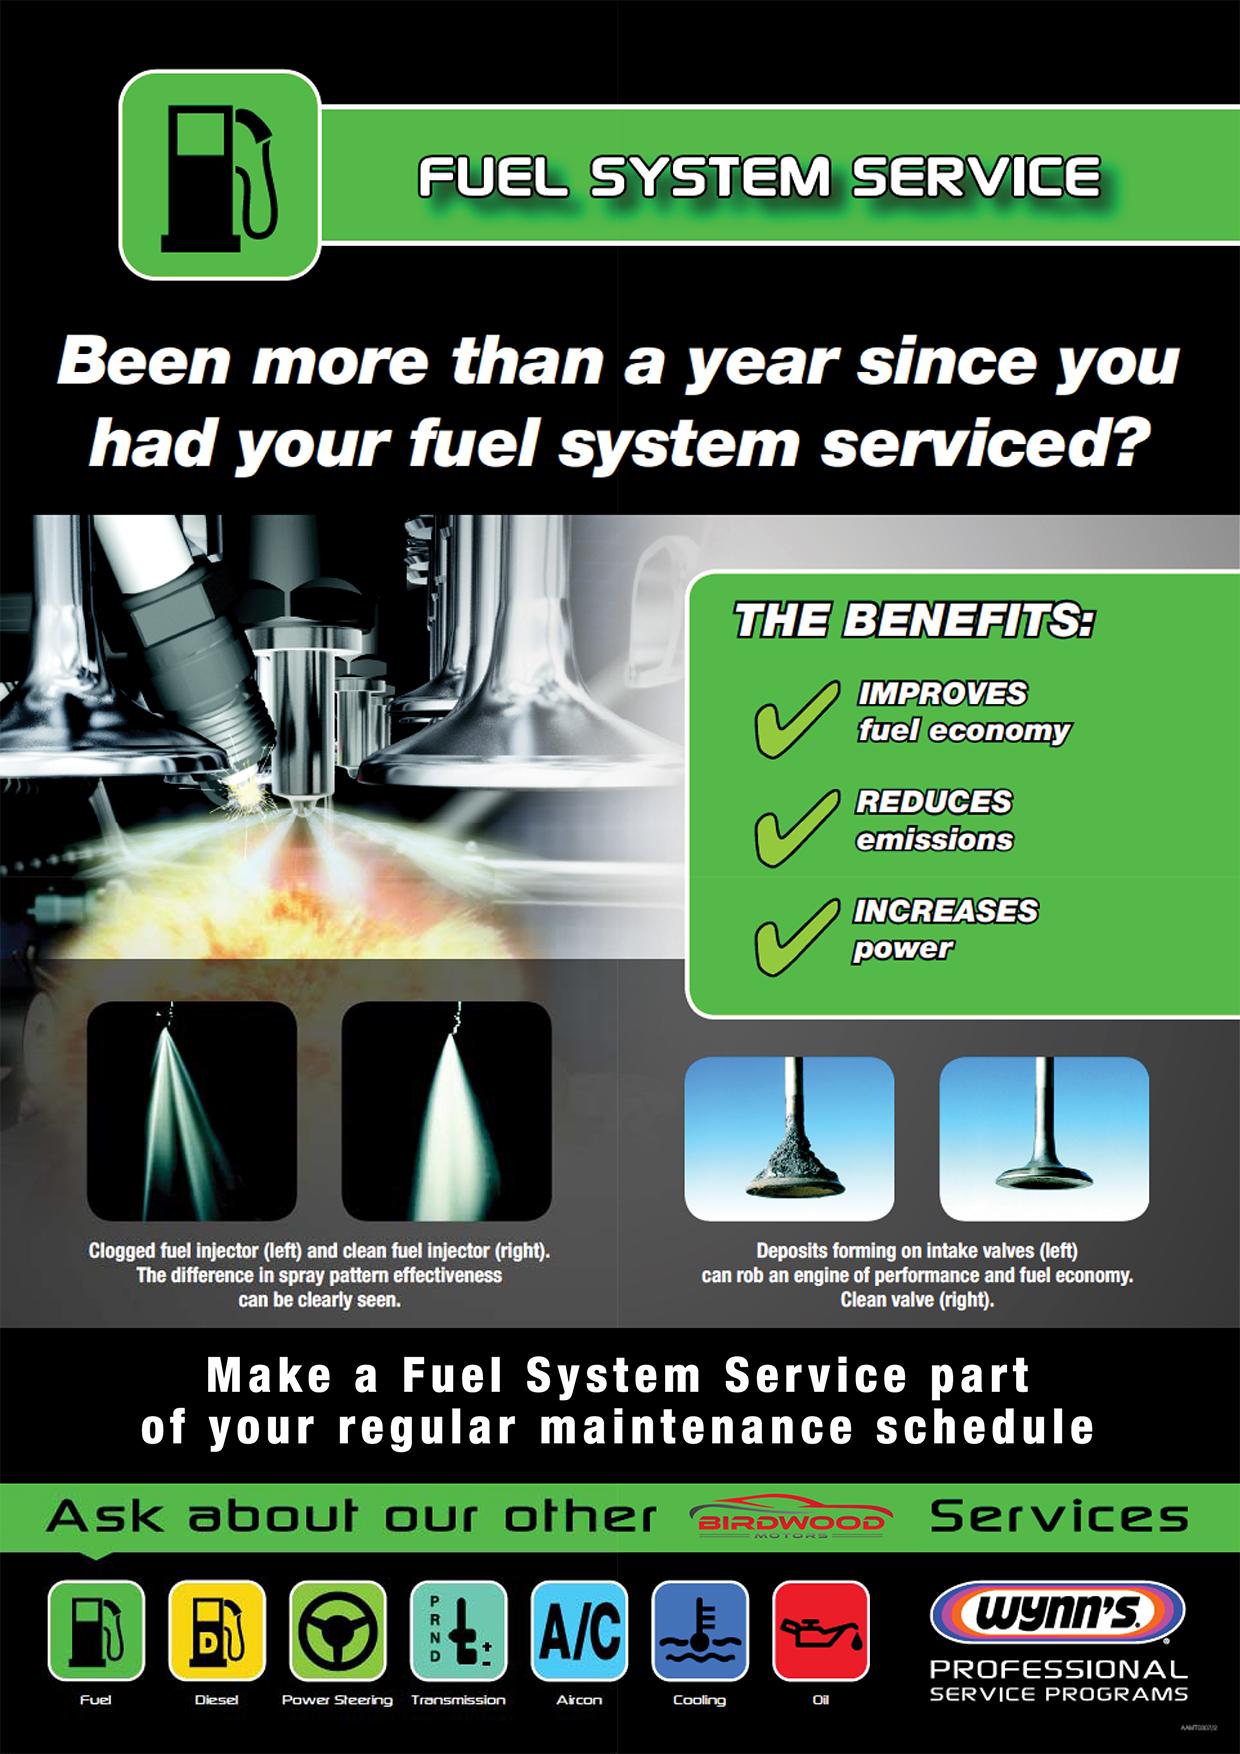 Fuel System Service Poster (Birdwood)